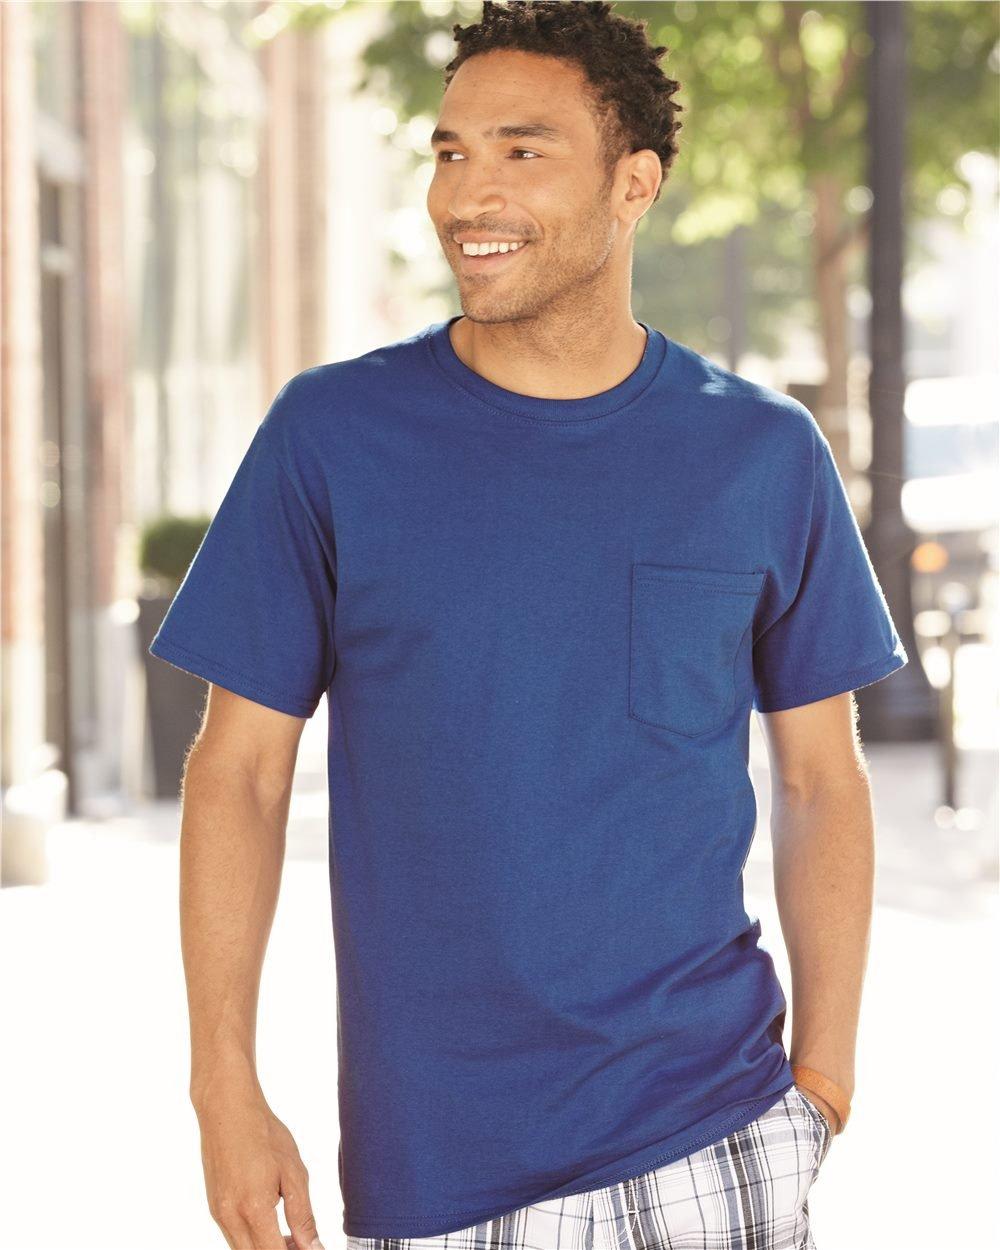 Fruit of the Loom Men's 4 Pack Pocket Crew Neck T Shirt Black X-Large